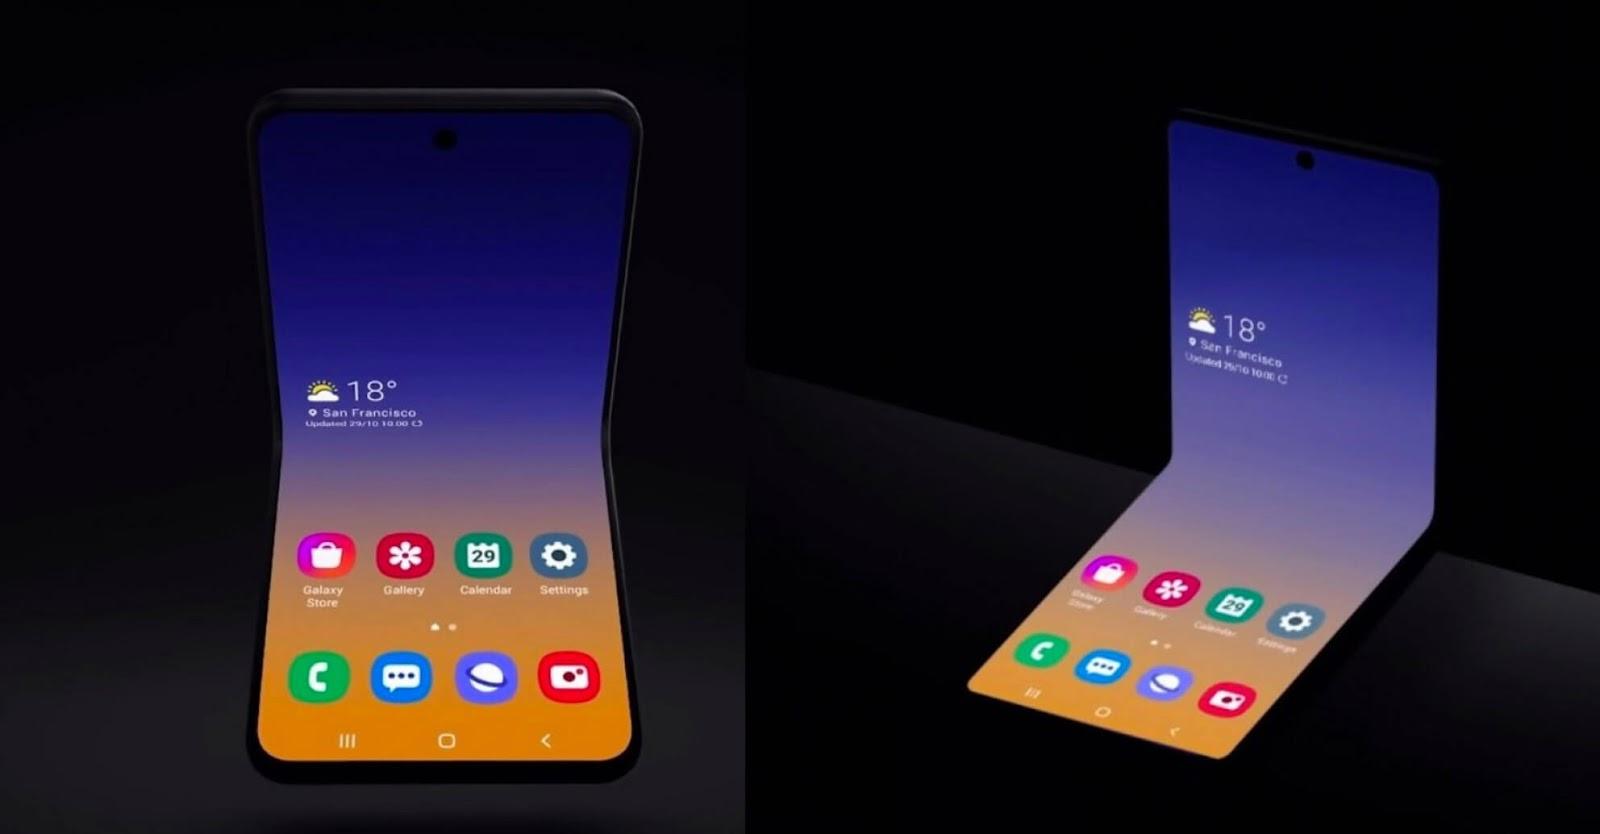 Bocoran Tersebar, Begini Foto Tampilan Samsung Galaxy Fold 2